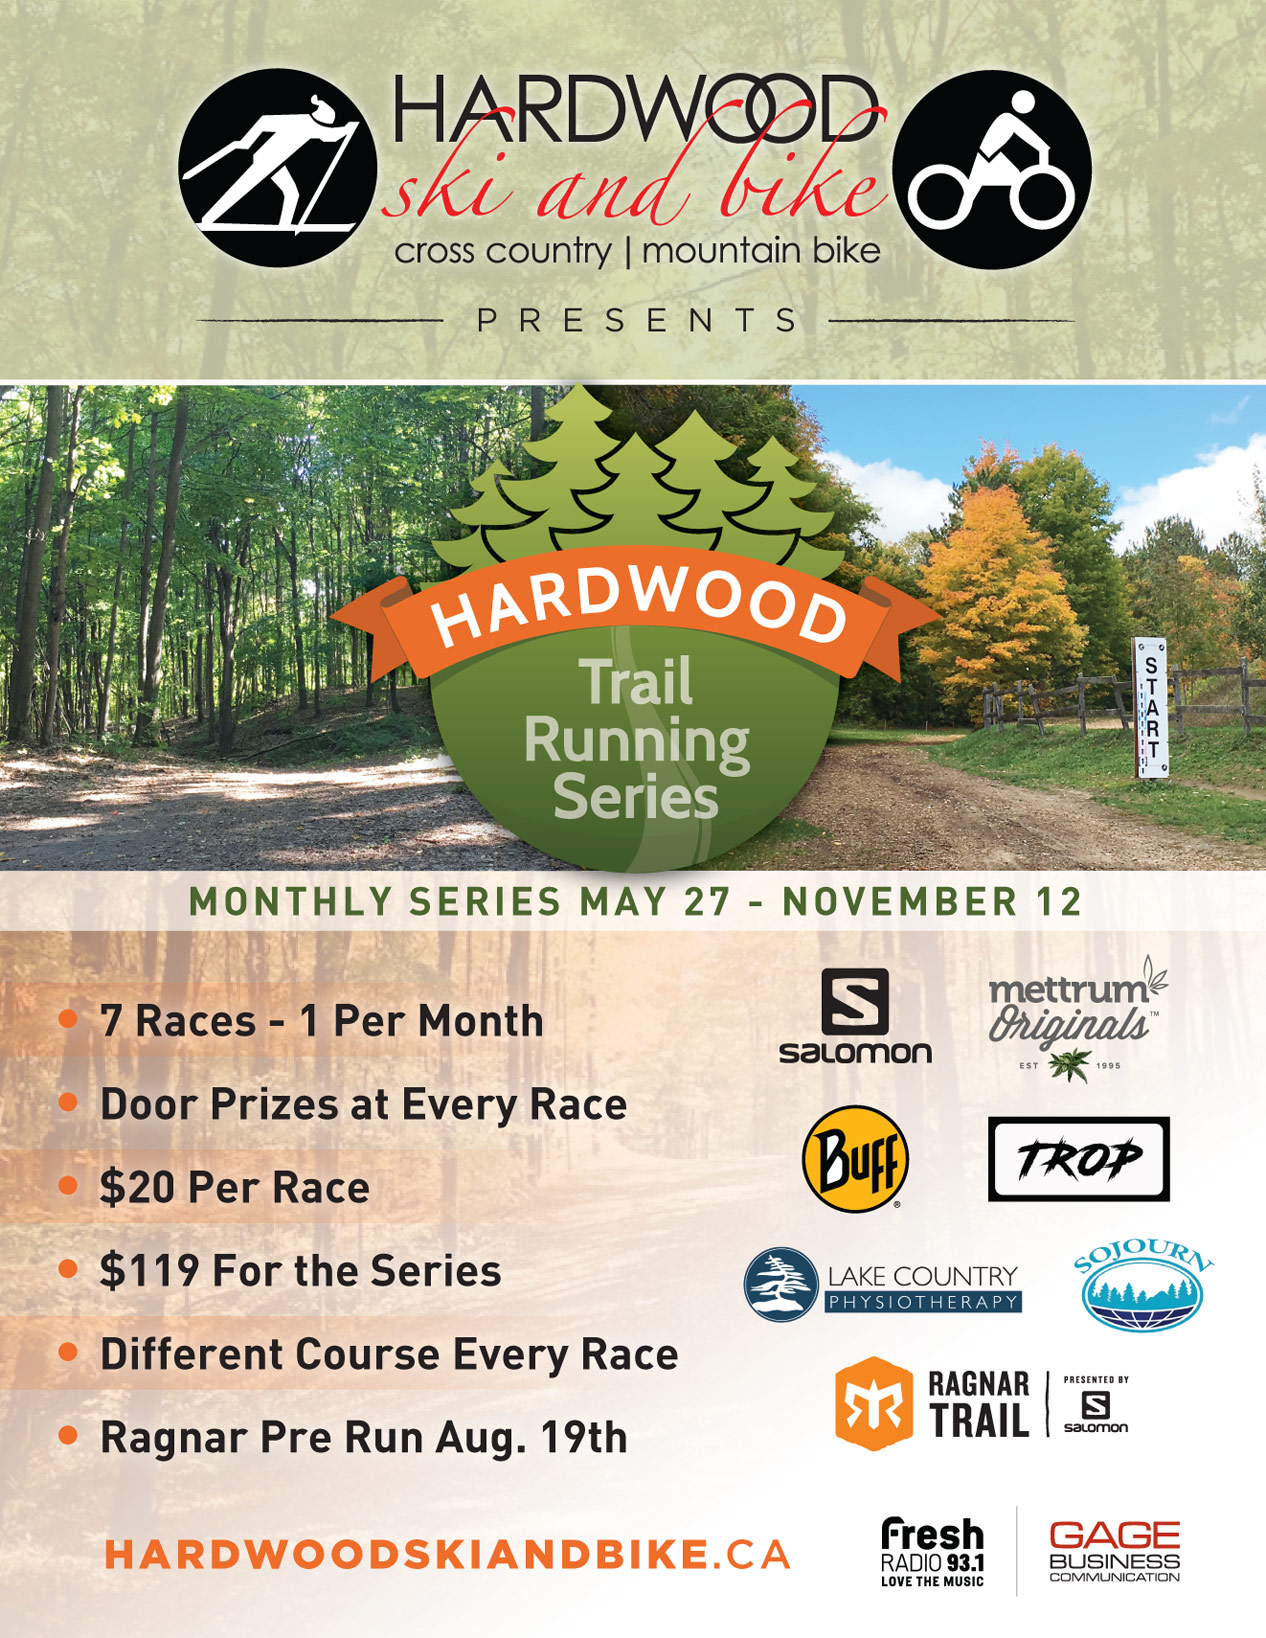 Hardwood Trail Running - Race 7 @ hardwood ski and bike